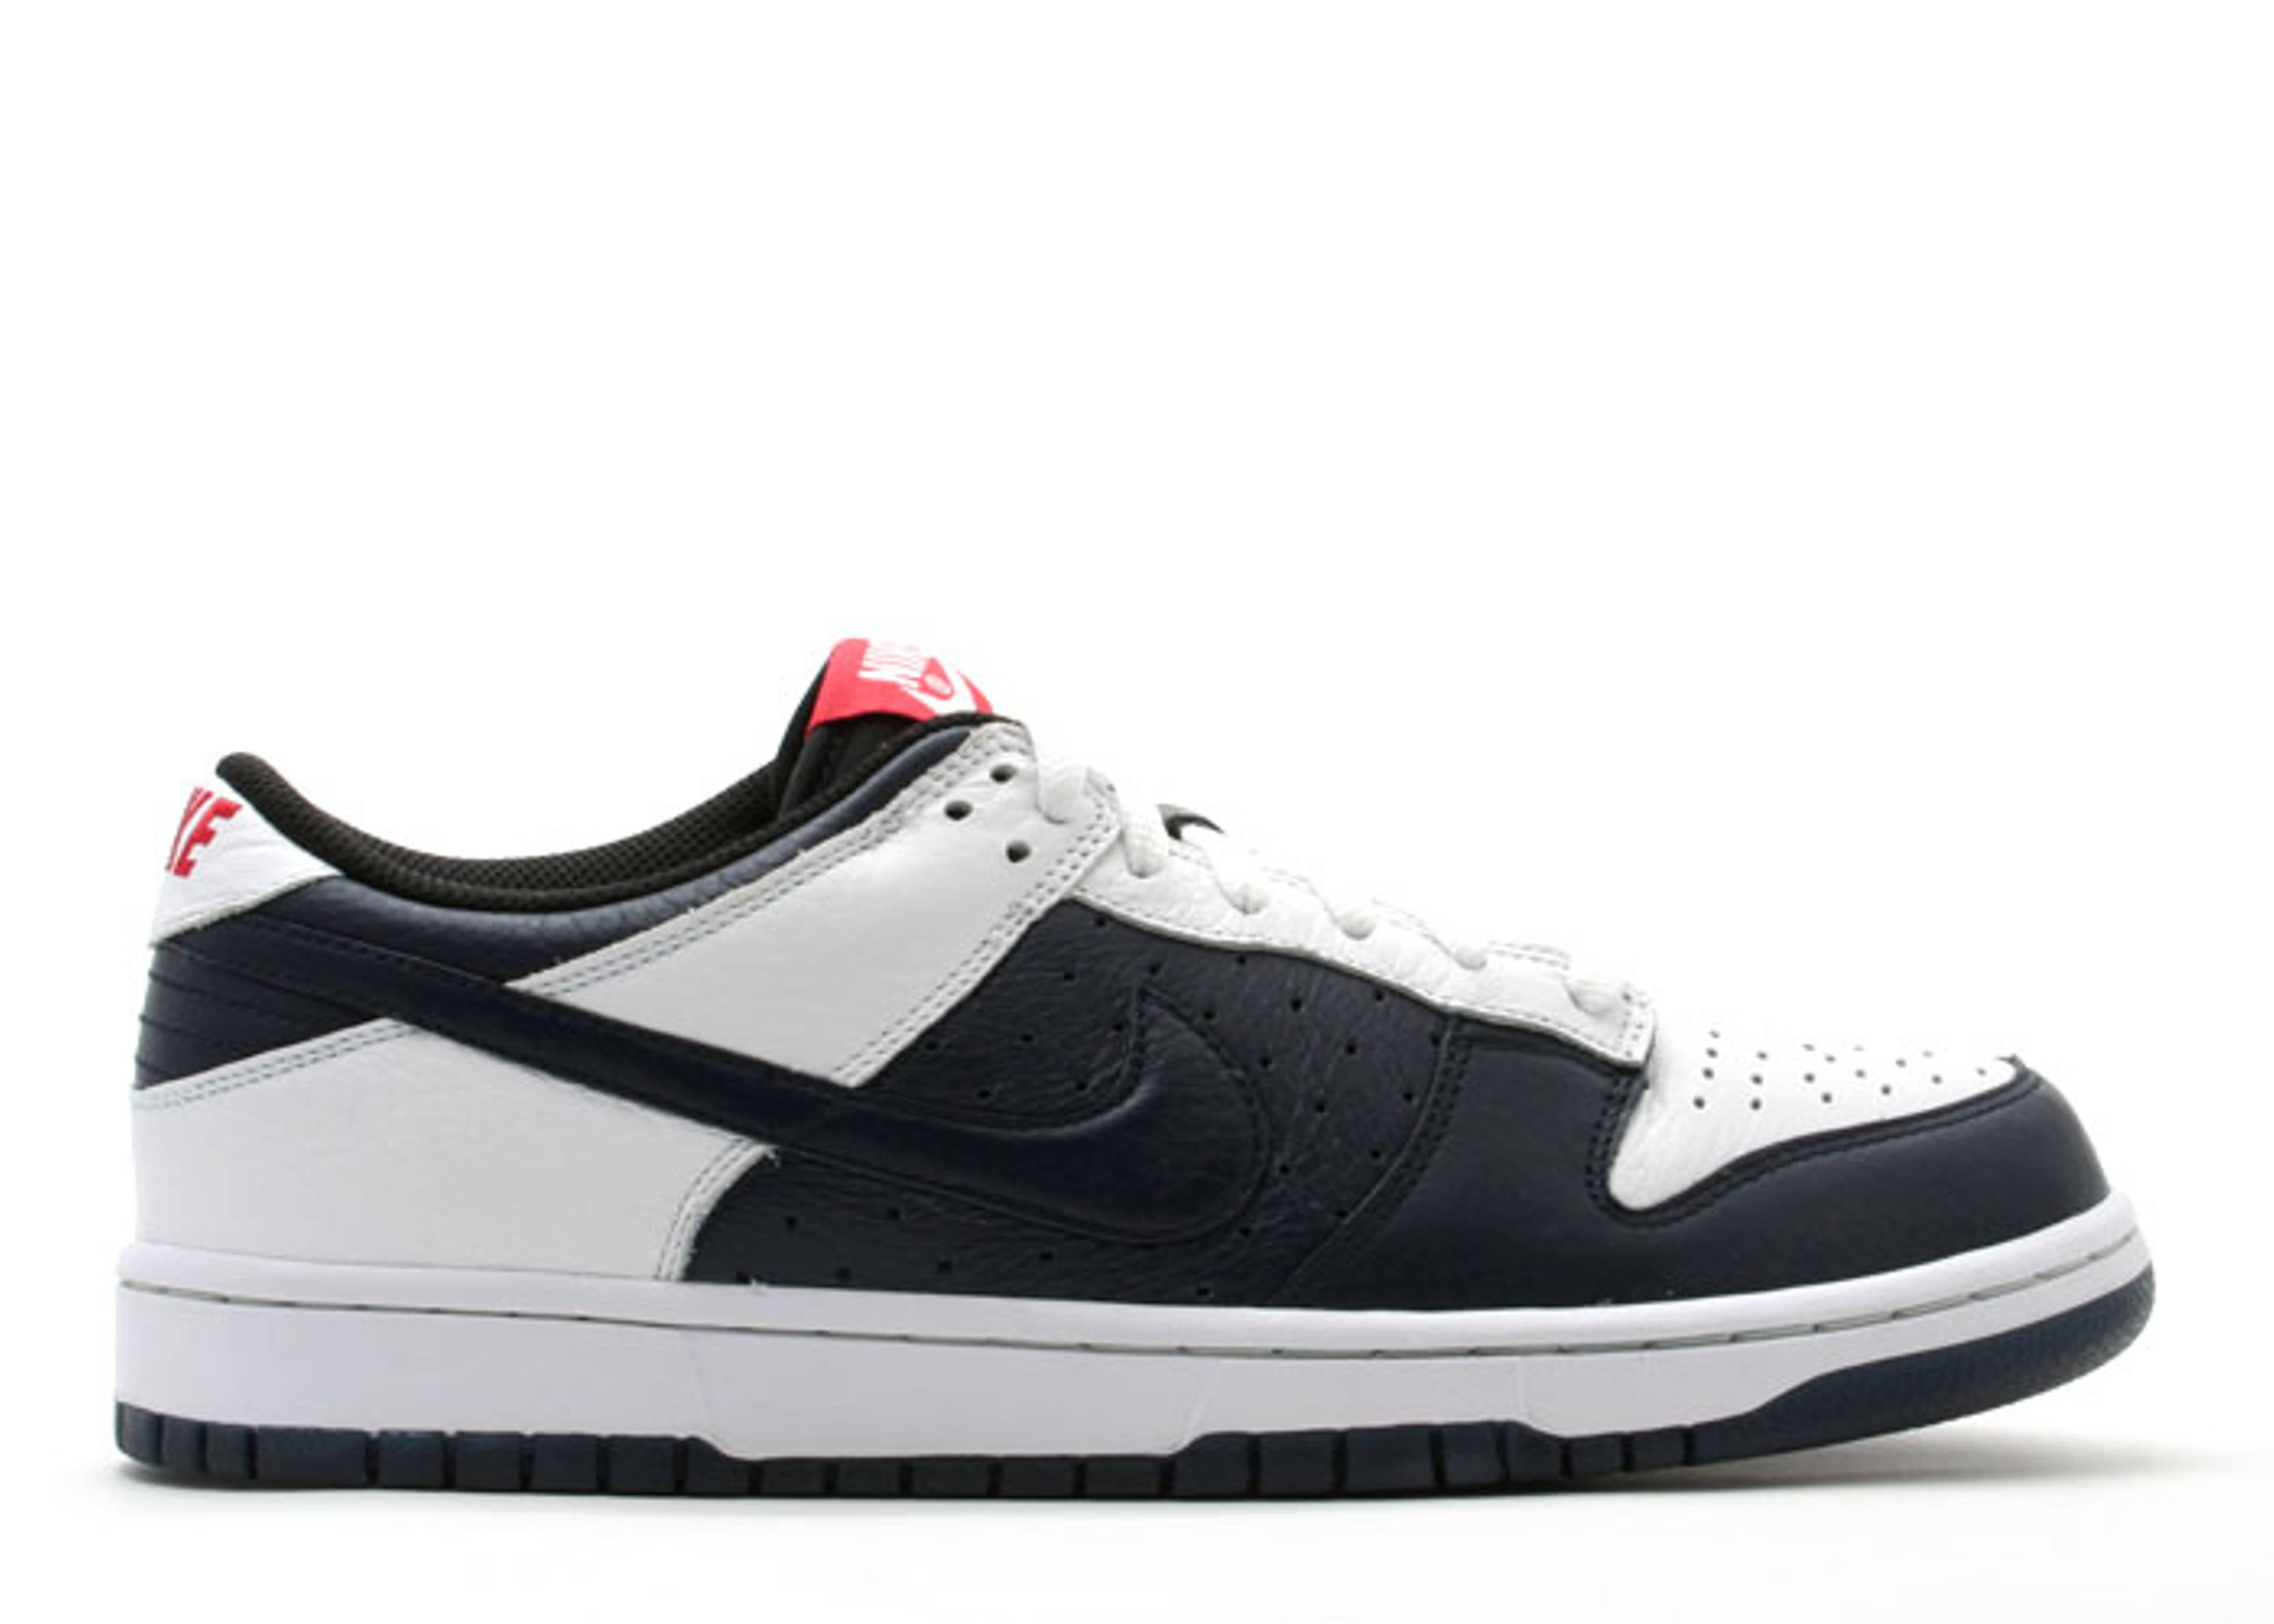 huge selection of 3f875 7bcc3 Nike Dunk - Air Jordan Pack ... nike. dunk low cl ...